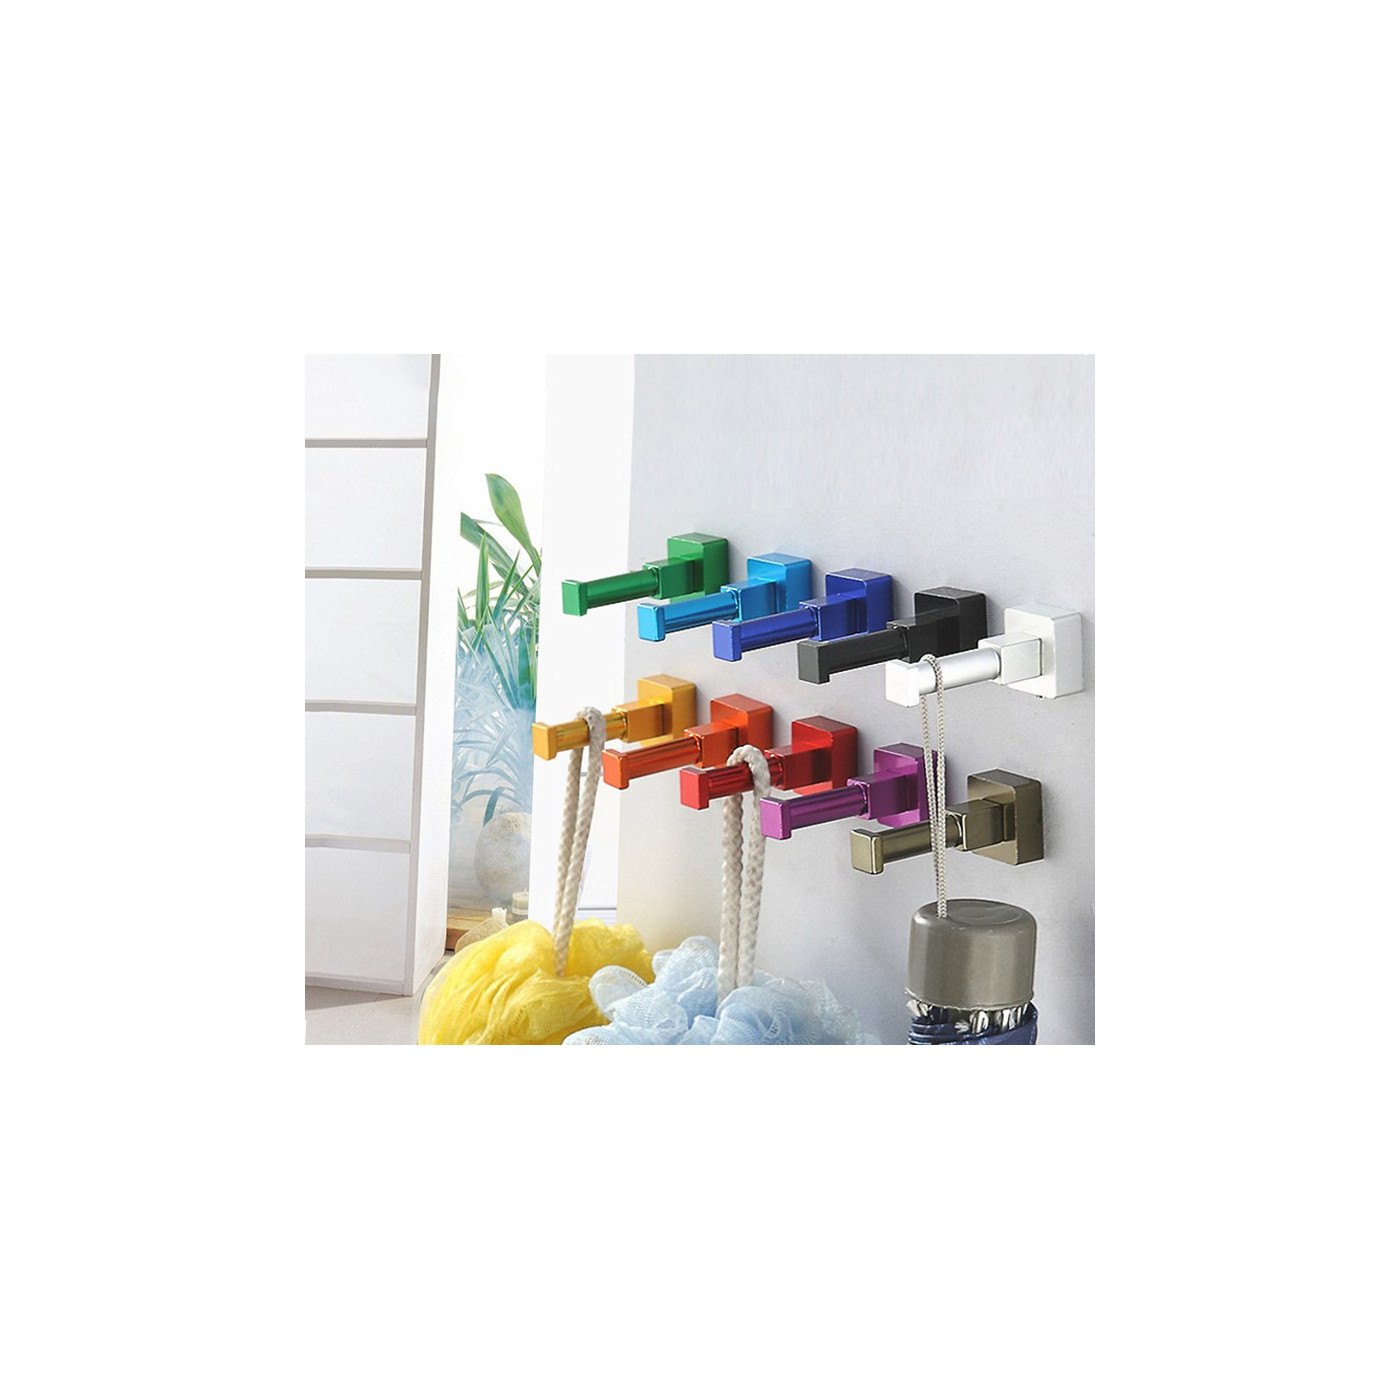 Set of 10 colorful clothes hooks (aluminum, square, dark blue)  - 1